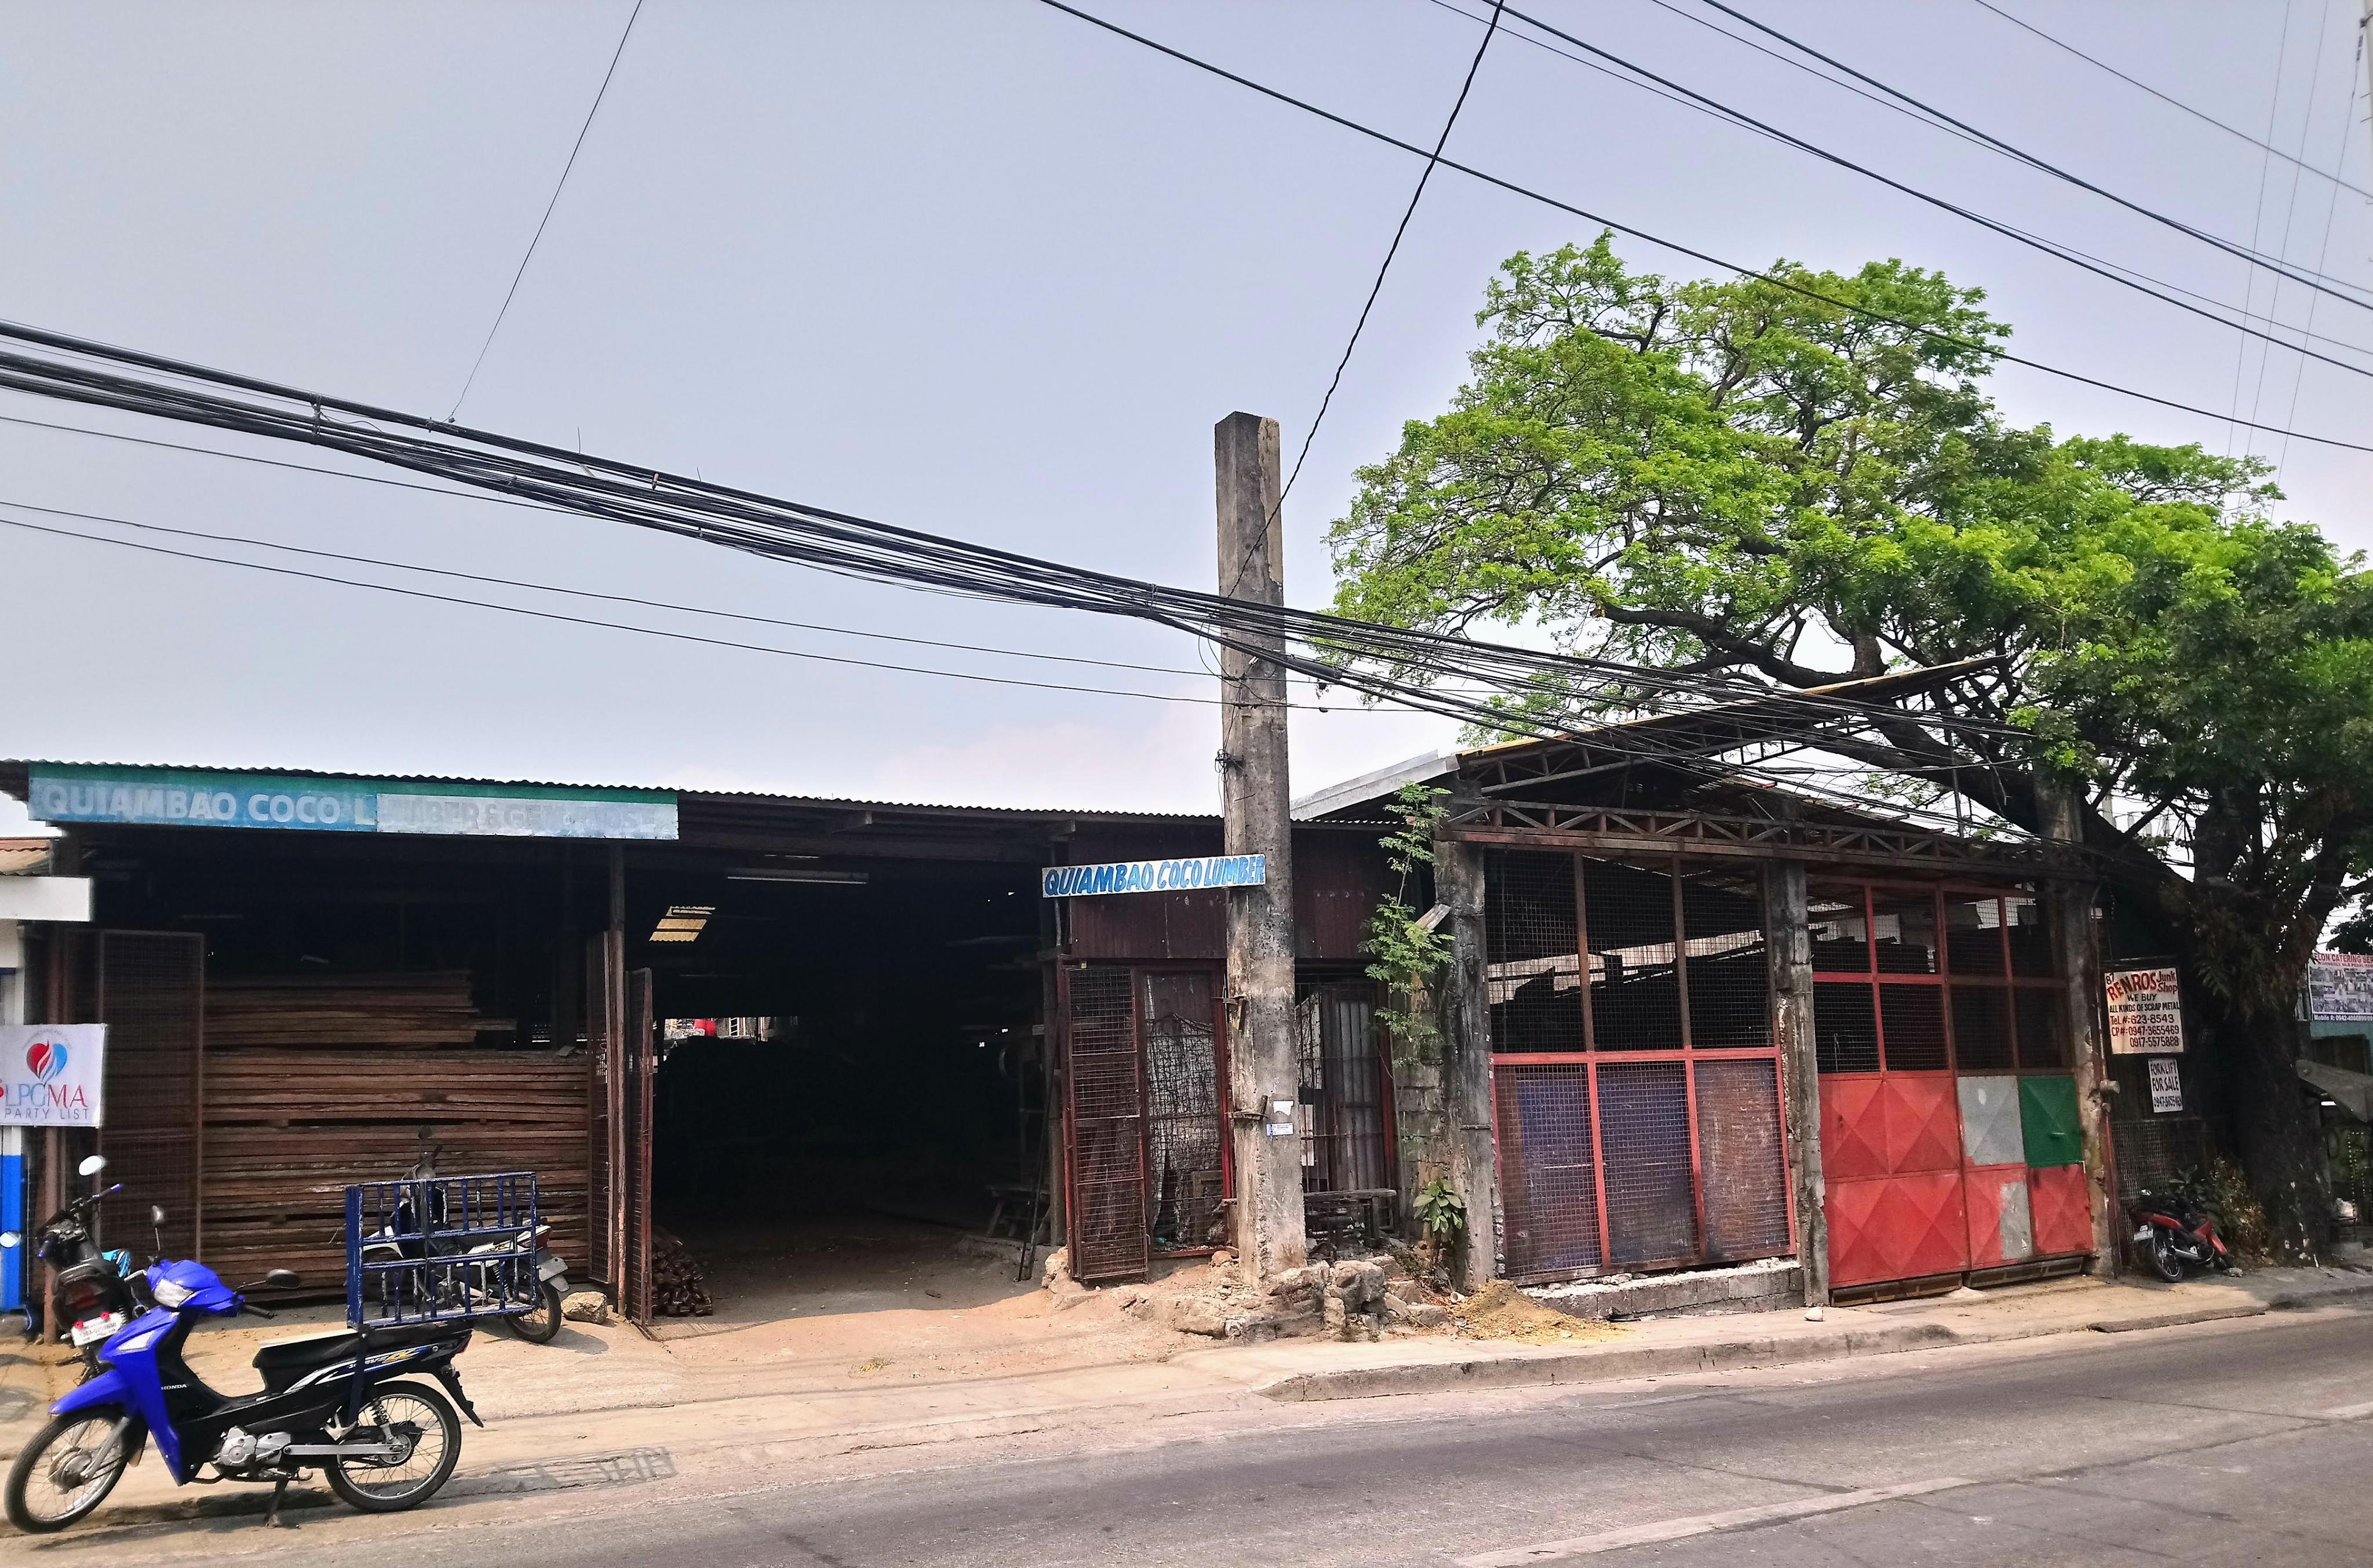 quiambao-coco-lumber-1